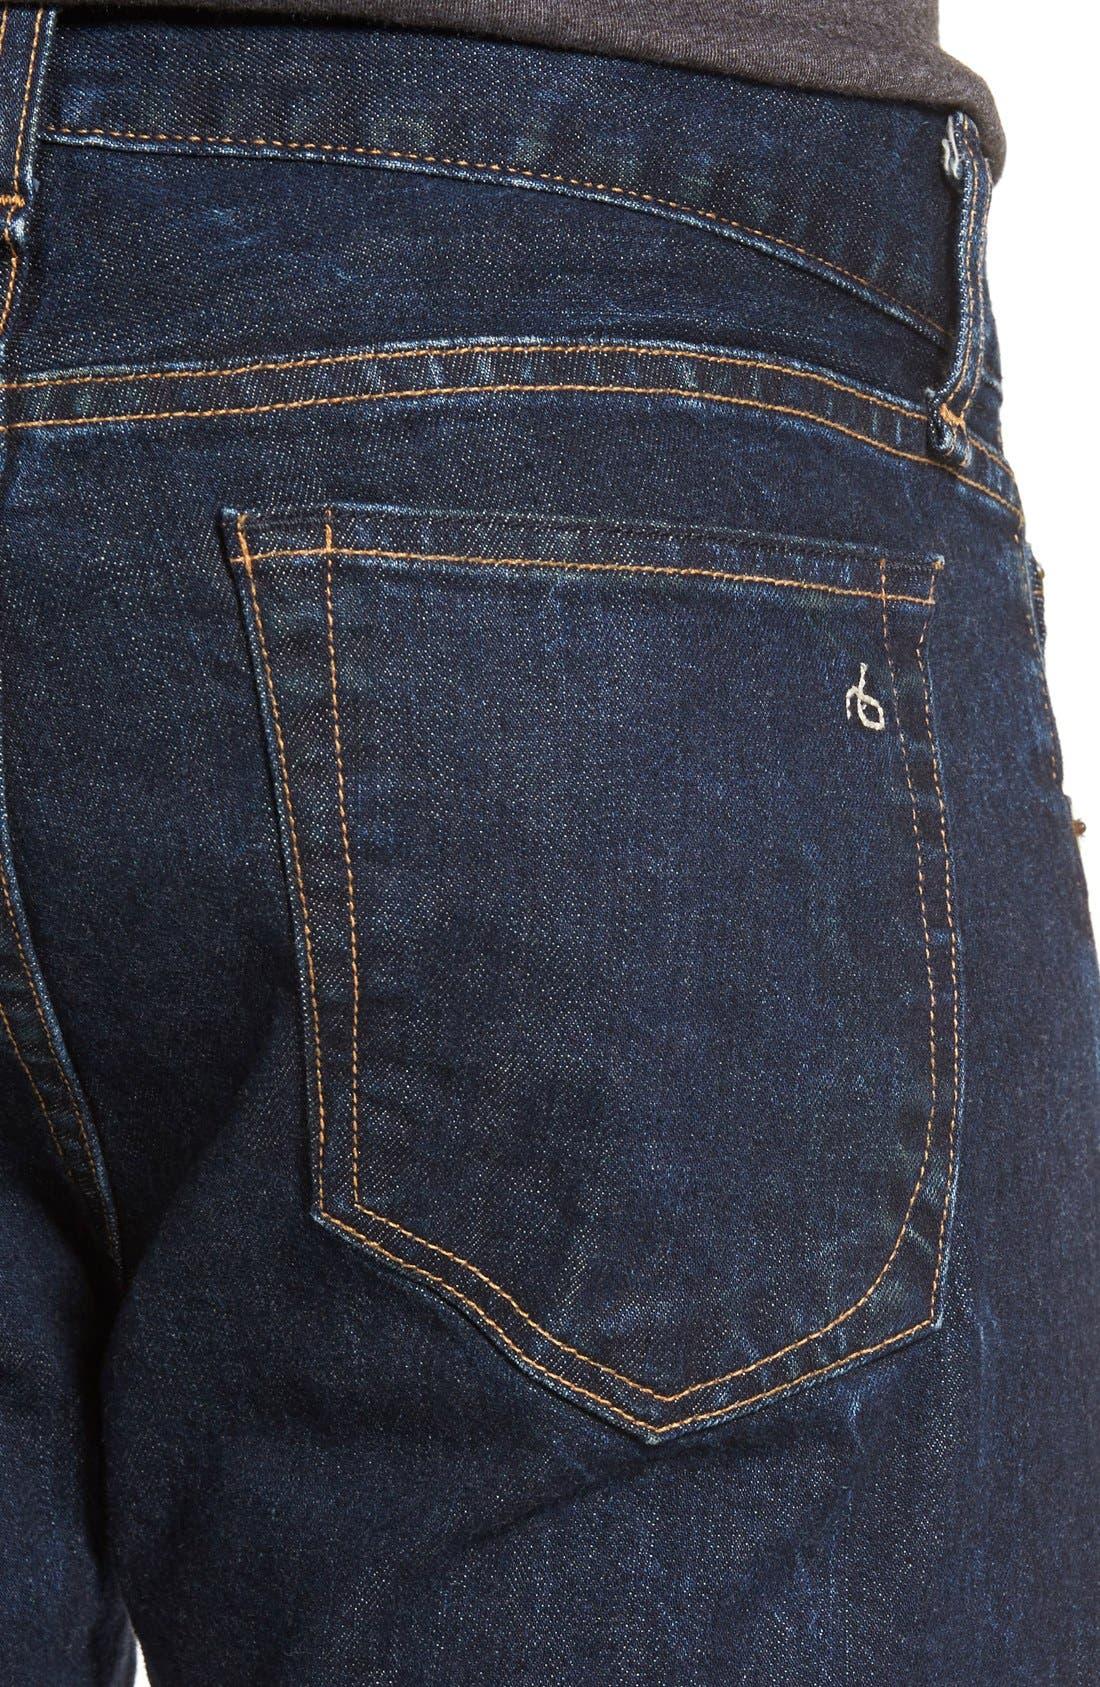 Standard Issue Fit 3 Slim Straight Leg Jeans,                             Alternate thumbnail 10, color,                             HERITAGE